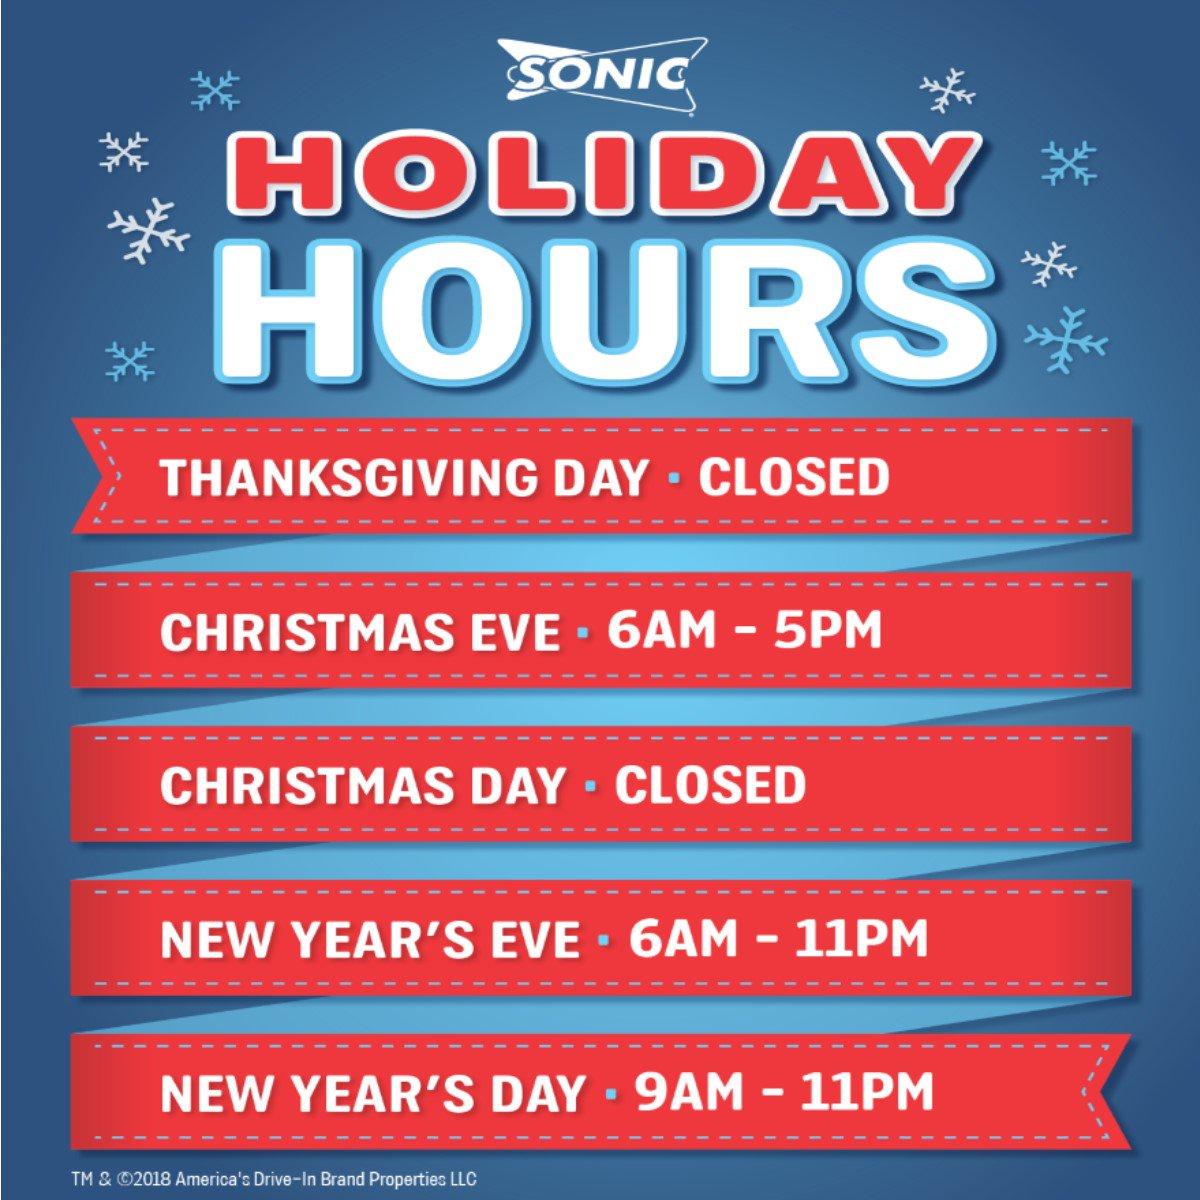 Sonic Christmas Hours.Sonic Of Phoenix Sonicofphoenix Twitter